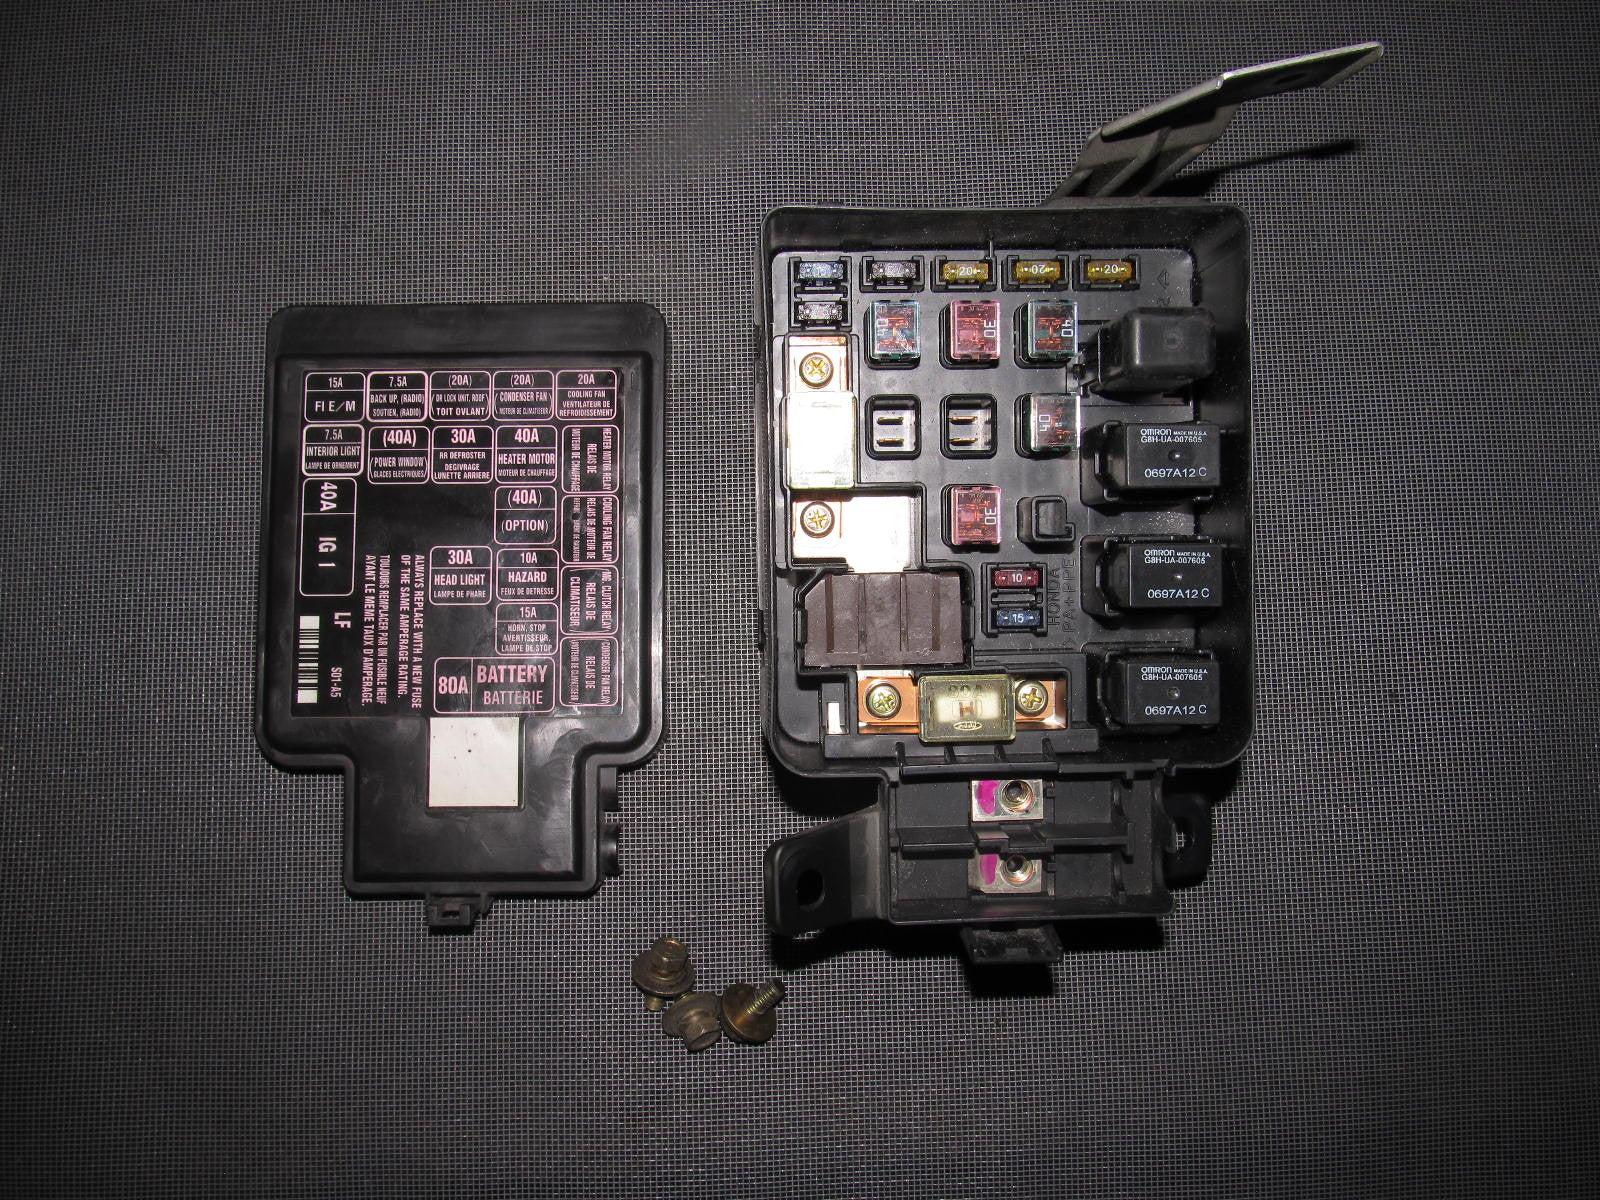 99 civic fuse box blog wiring diagram 95 civic fuse box wiring civic fuse box wiring [ 1600 x 1200 Pixel ]